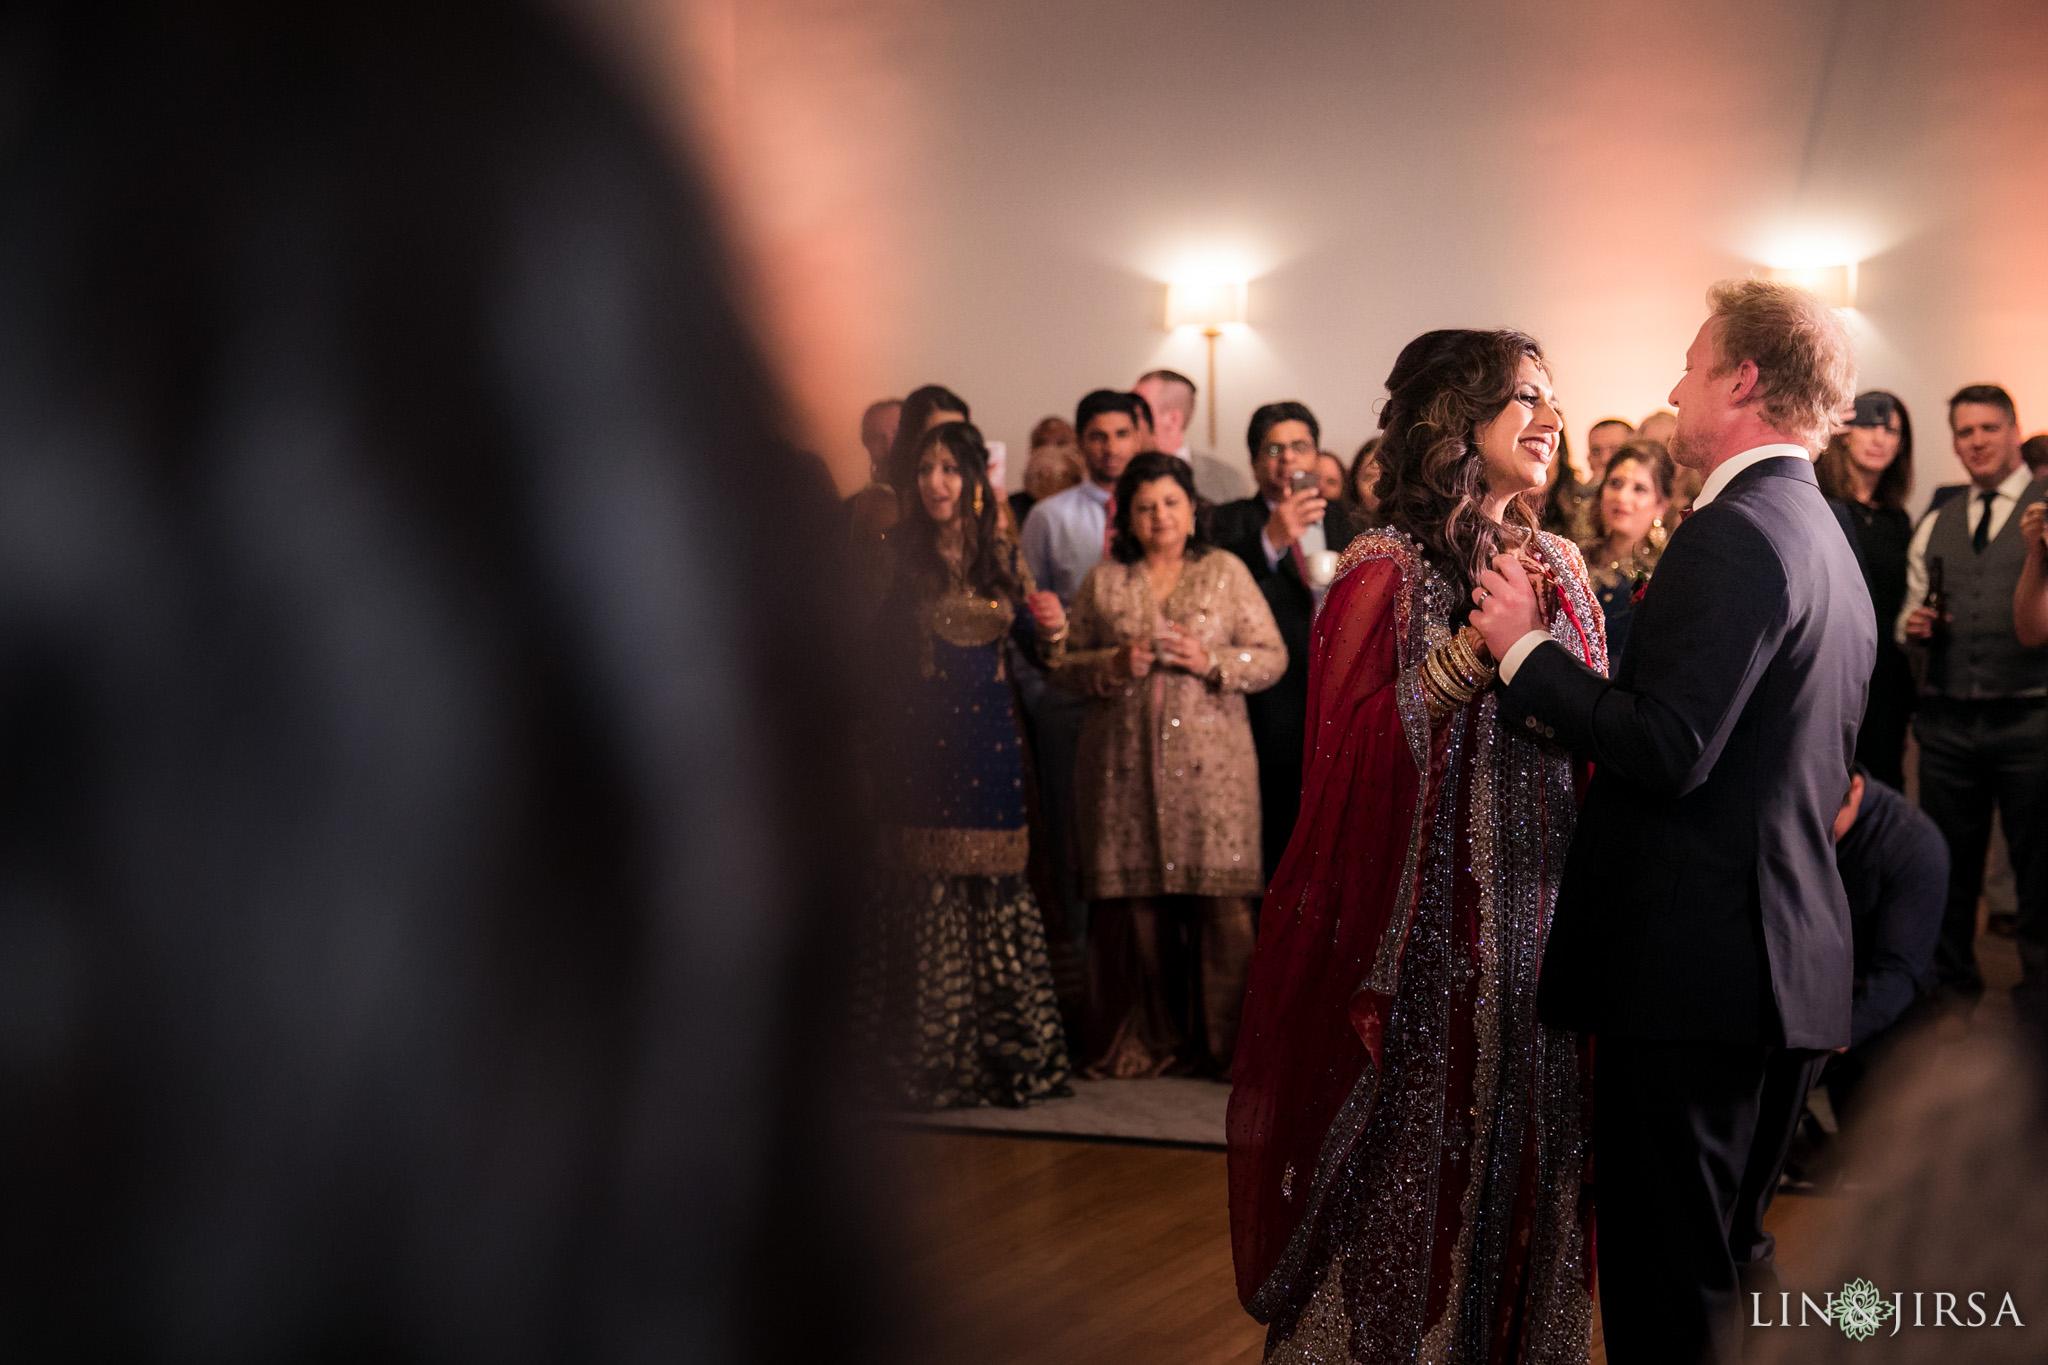 41 altadena town country club pakistani wedding reception photography